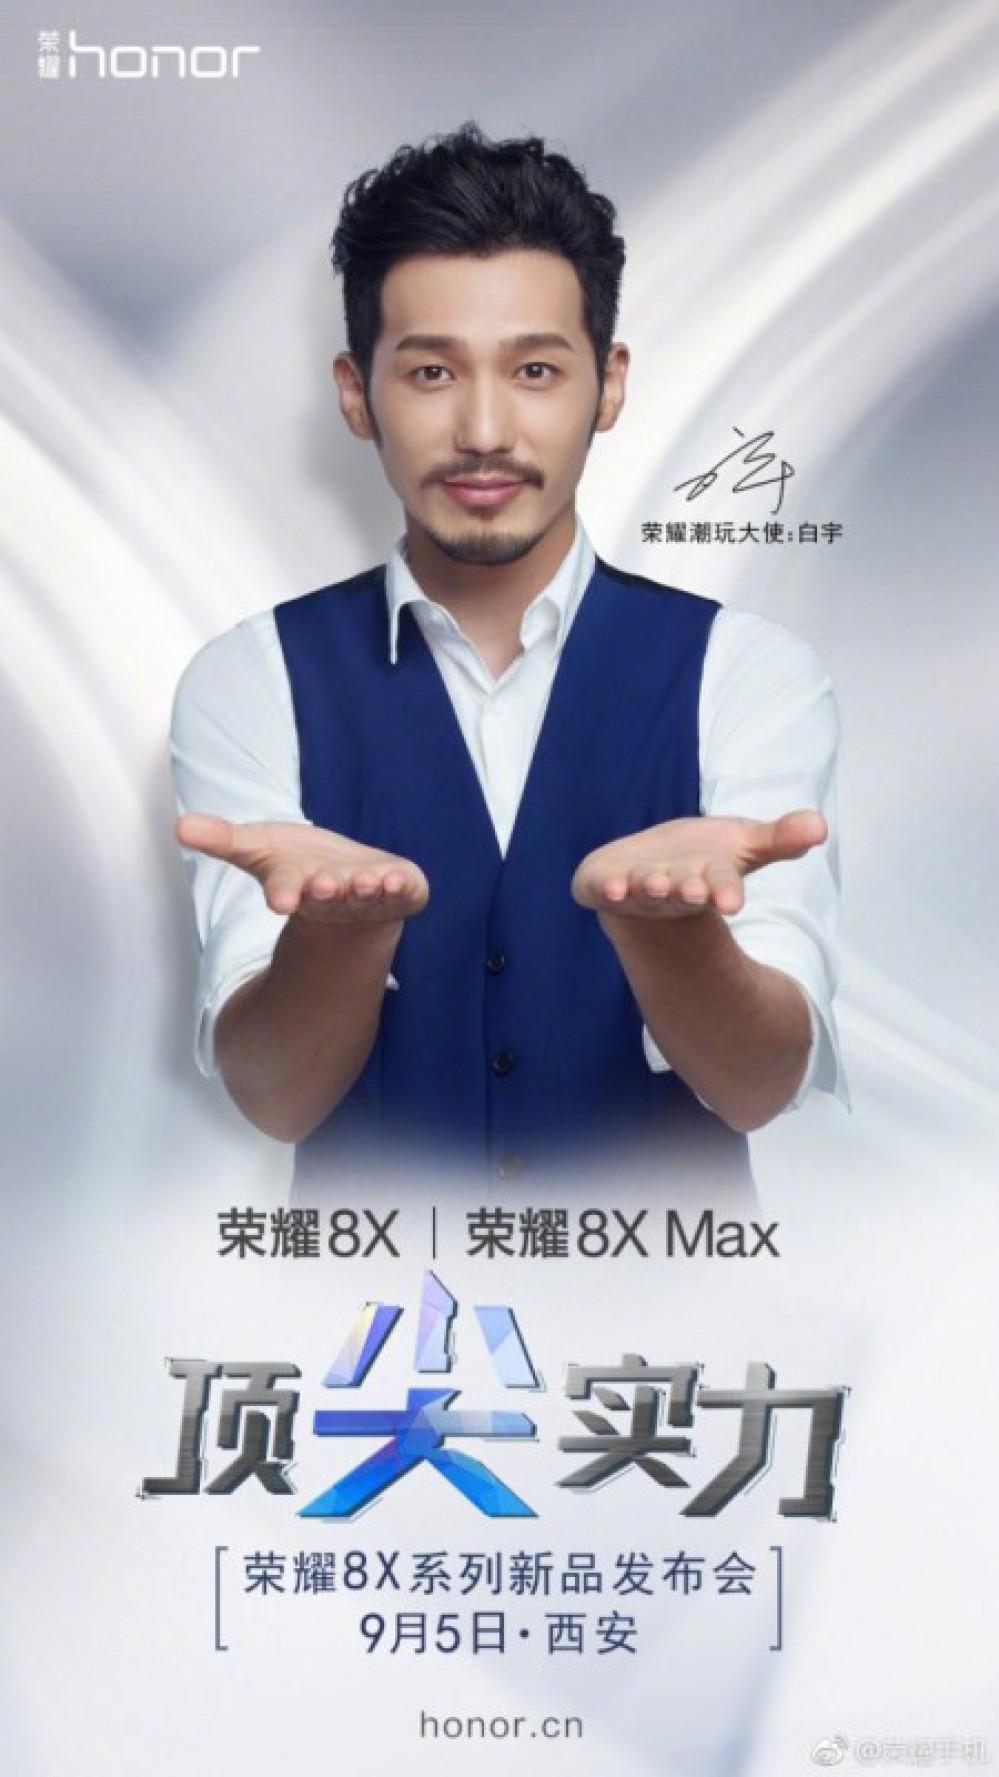 Honor 8X/8X Max: Επίσημη παρουσίαση στις 5 Σεπτεμβρίου για τα νέα smartphones της εταιρείας